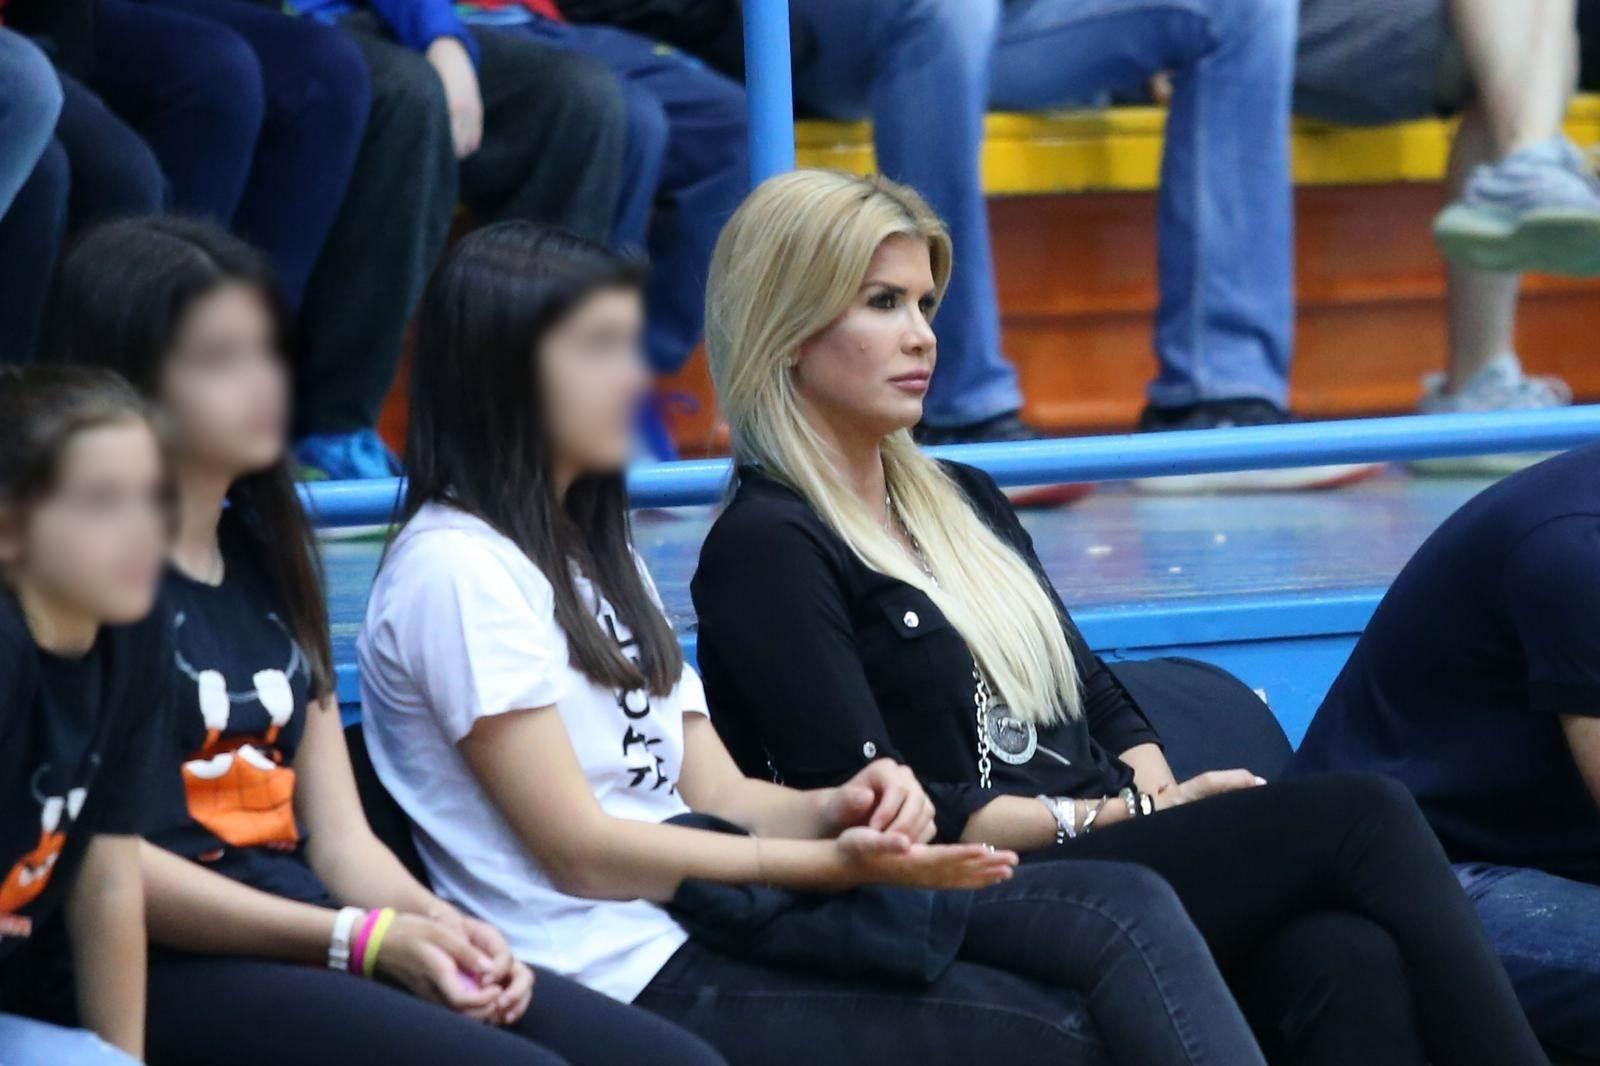 Deshonestidad Eh tener  Emil Tedeschi i supruga napokon uhvaćeni u javnosti | STORYHR